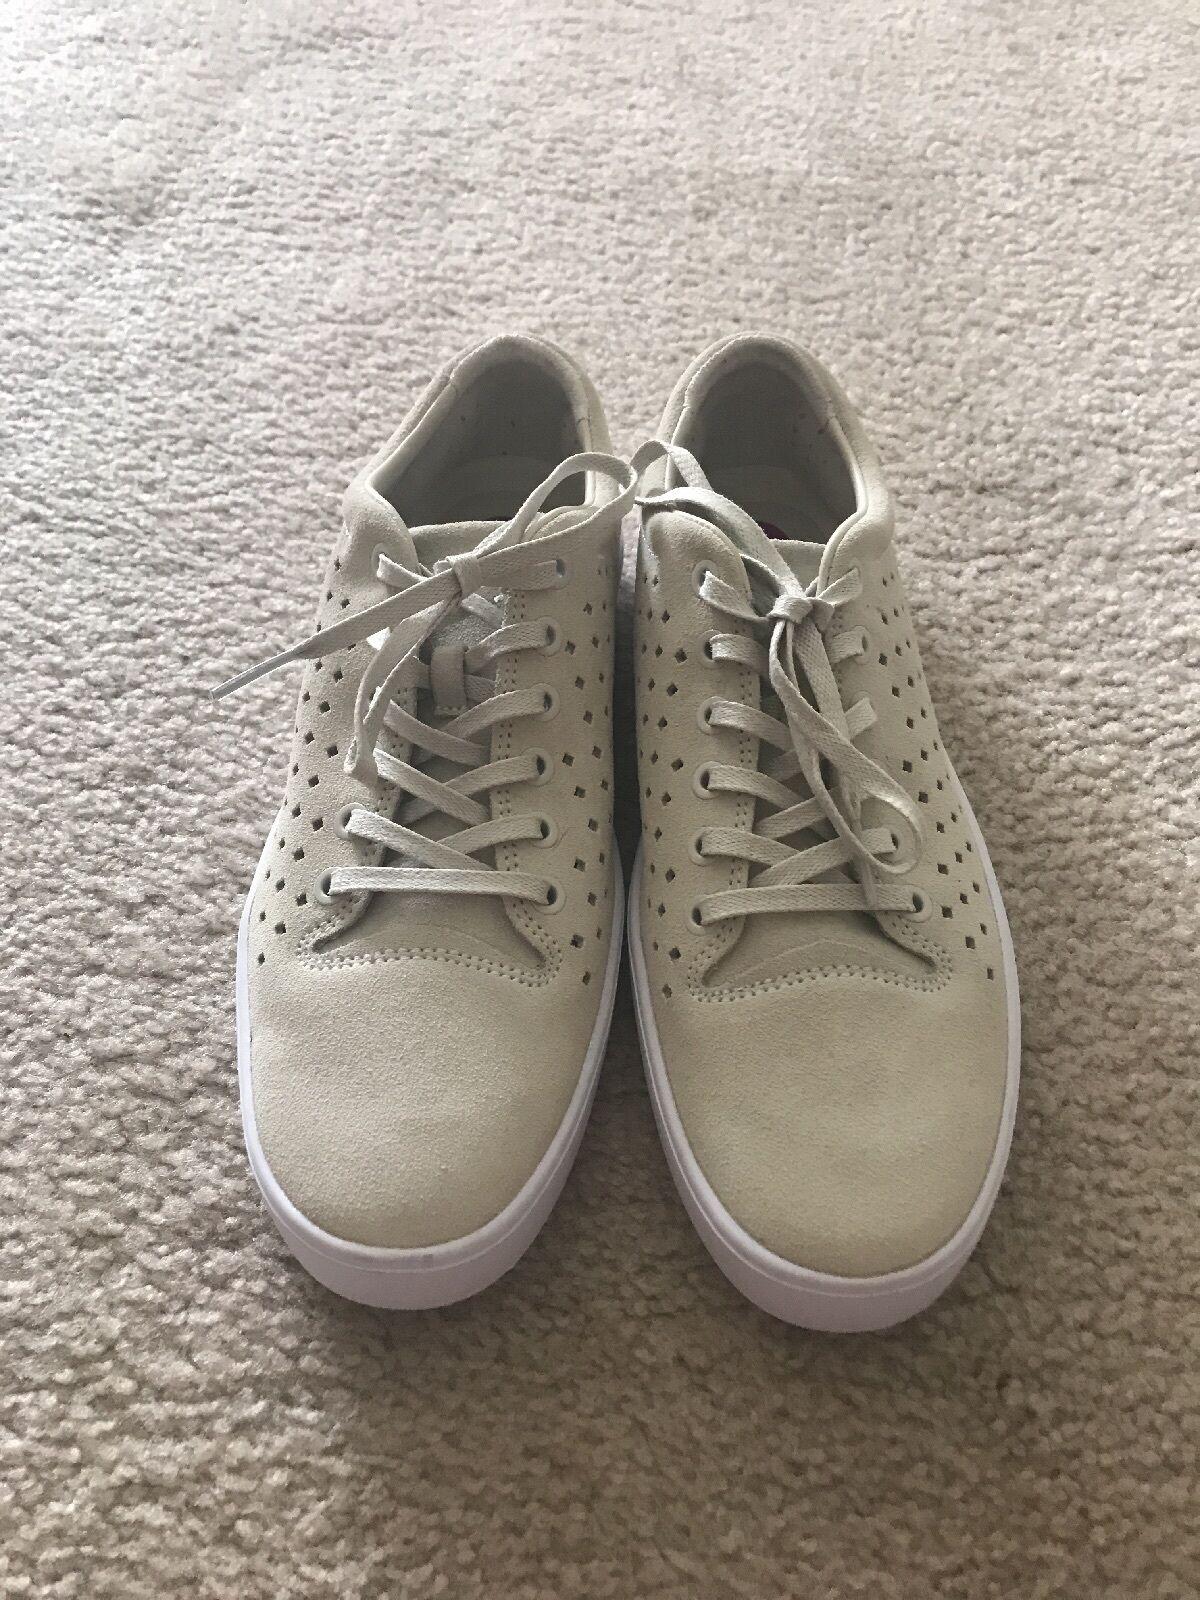 Lacoste Damenschuhe Tamora Lace Up 216 1 Fashion Größe Sneaker Schuhe Off Weiß Größe Fashion 8.5 M US 77d1ed